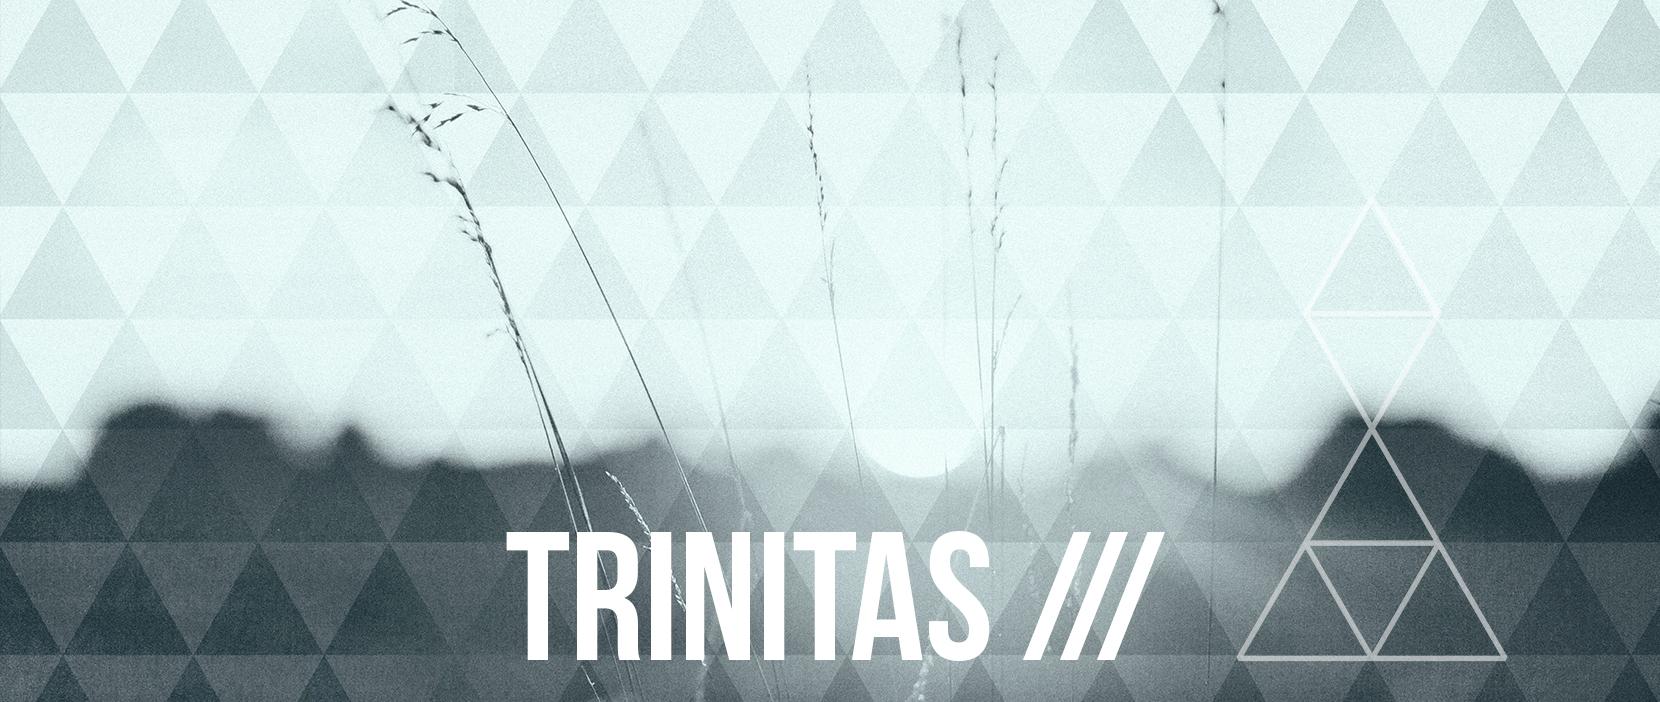 Main image for The Trinity.